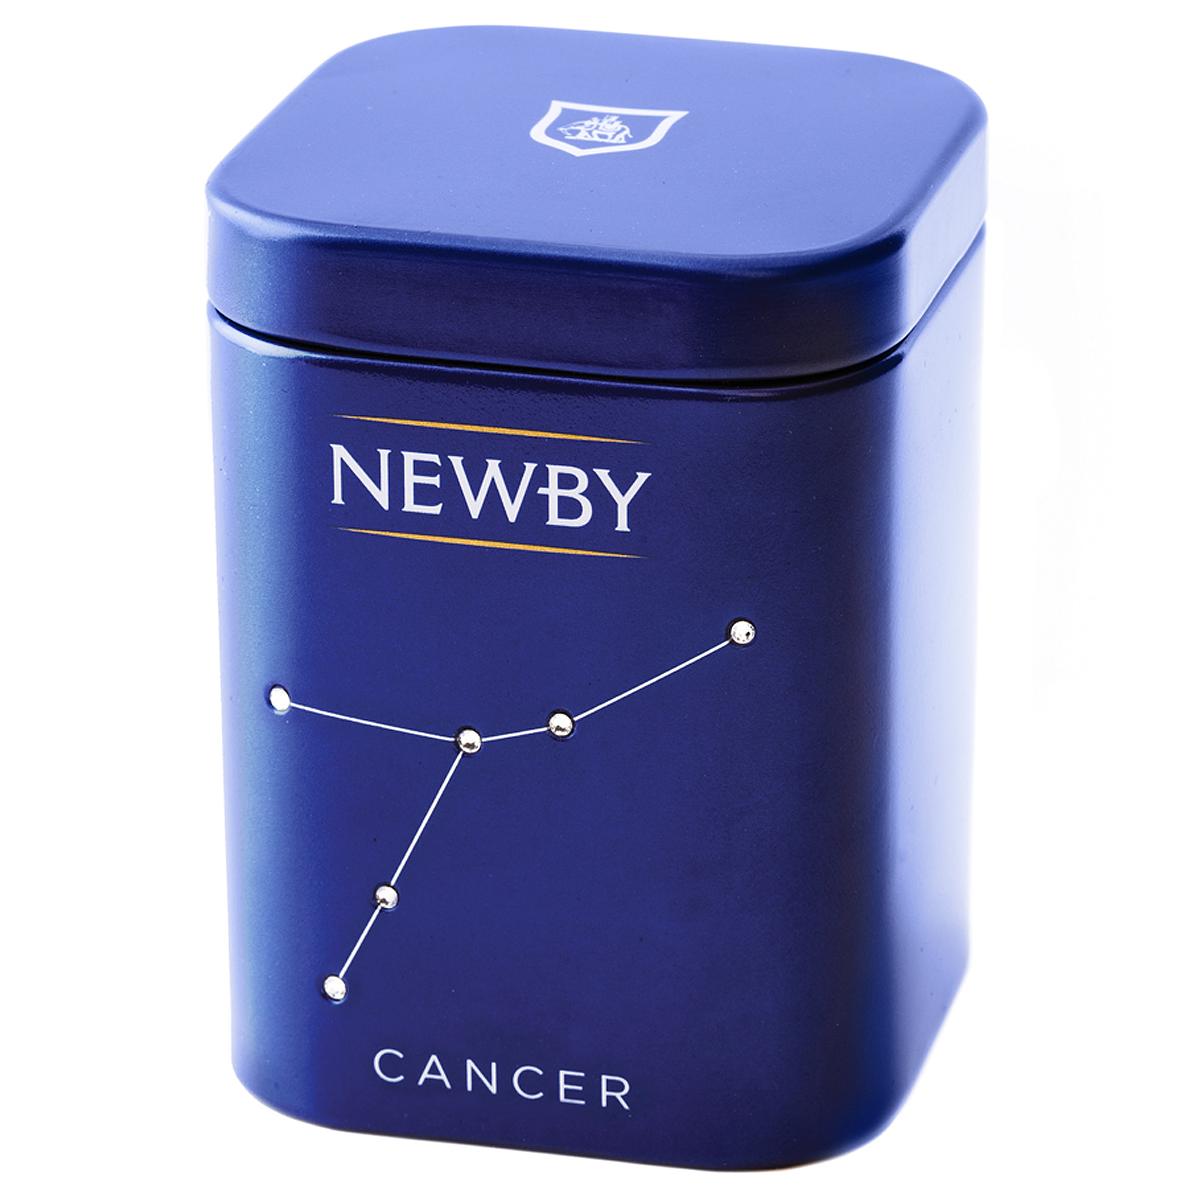 Newby Cancer Fujian Oolong подарочный набор листового чая, 25 г (ж/б) dvb t isdb digital tv box for our car dvd player